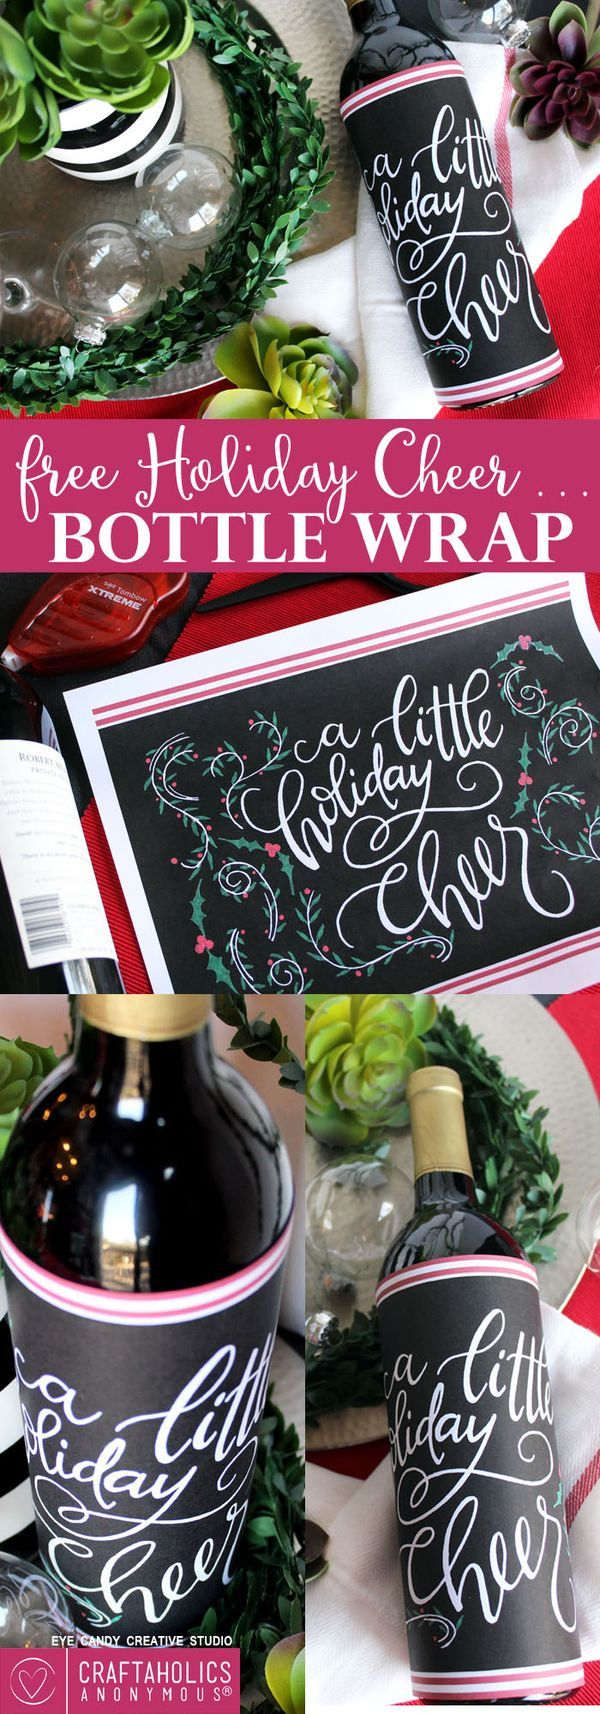 Christmas Party Hostess Gift Ideas Part - 22: Free Holiday Printable Free Printable Bottle Wrap Free Christmas Printable.  Christmas DiyChristmas PartiesChristmas Gift IdeasHoliday ...